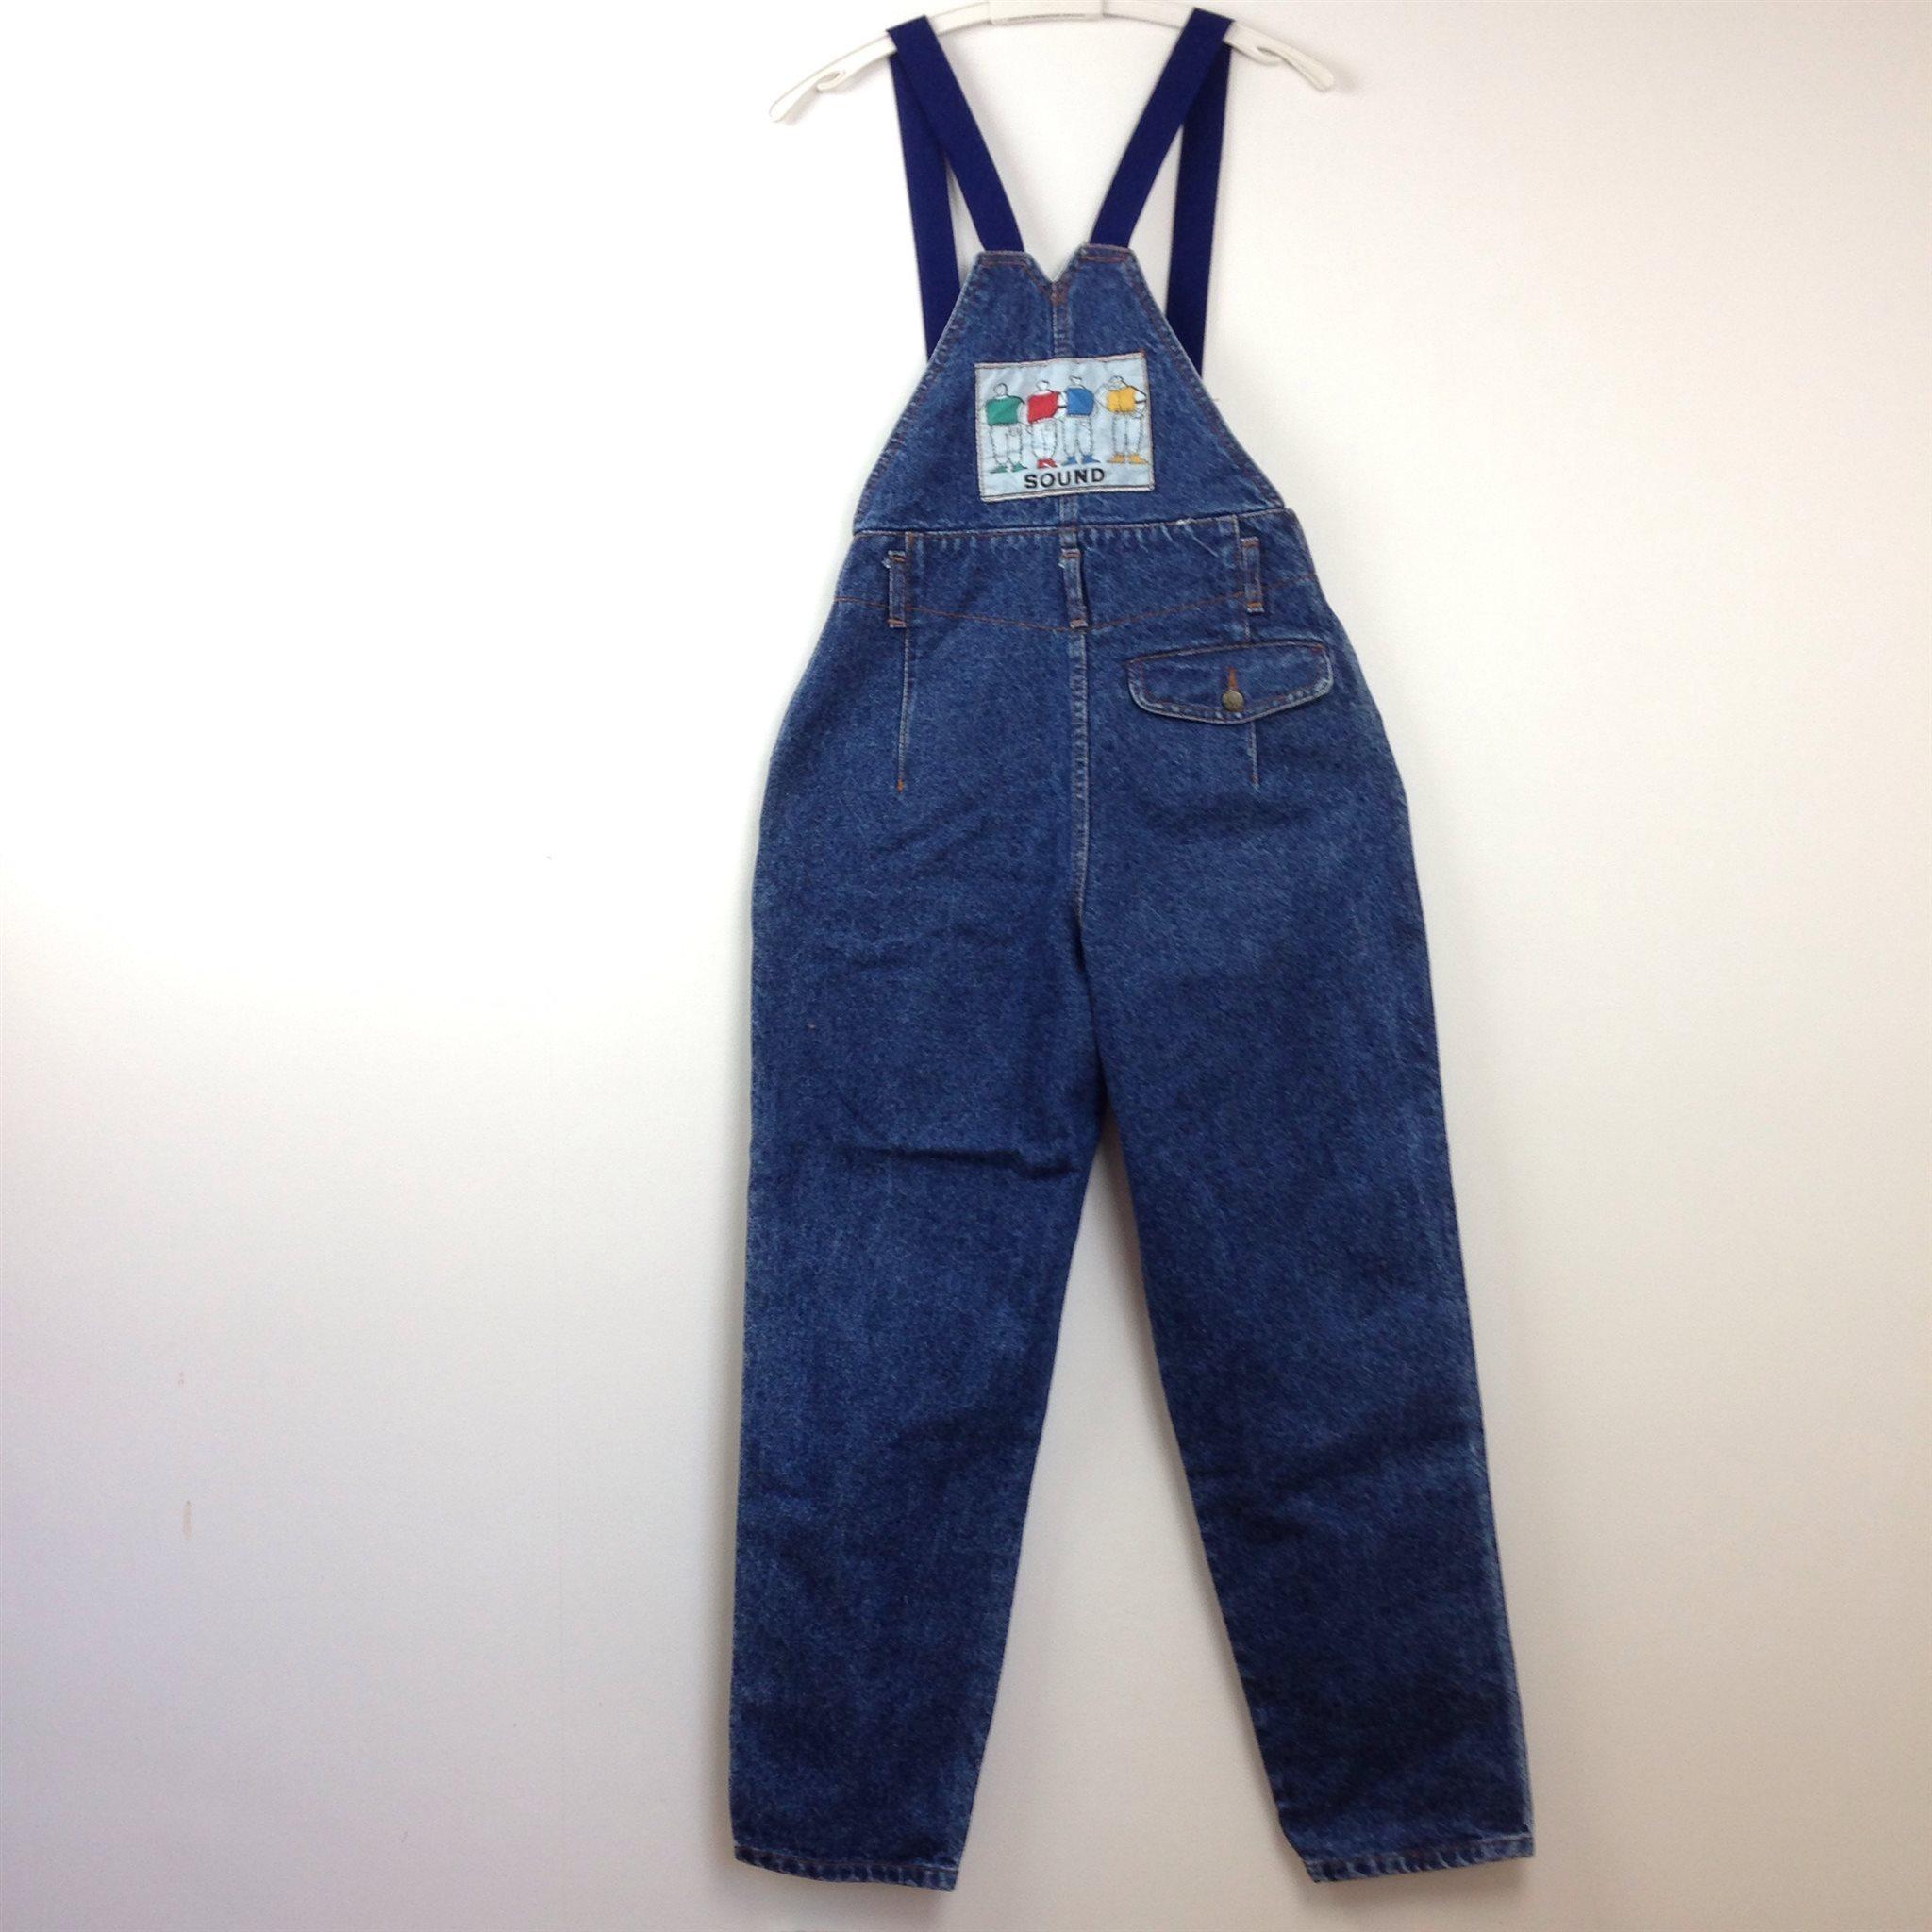 31e29e8a944 SOUND STONE WASH Jeans Hängselbyxor 80-tal 90-tal Vintage Retro Stentvätt  ...